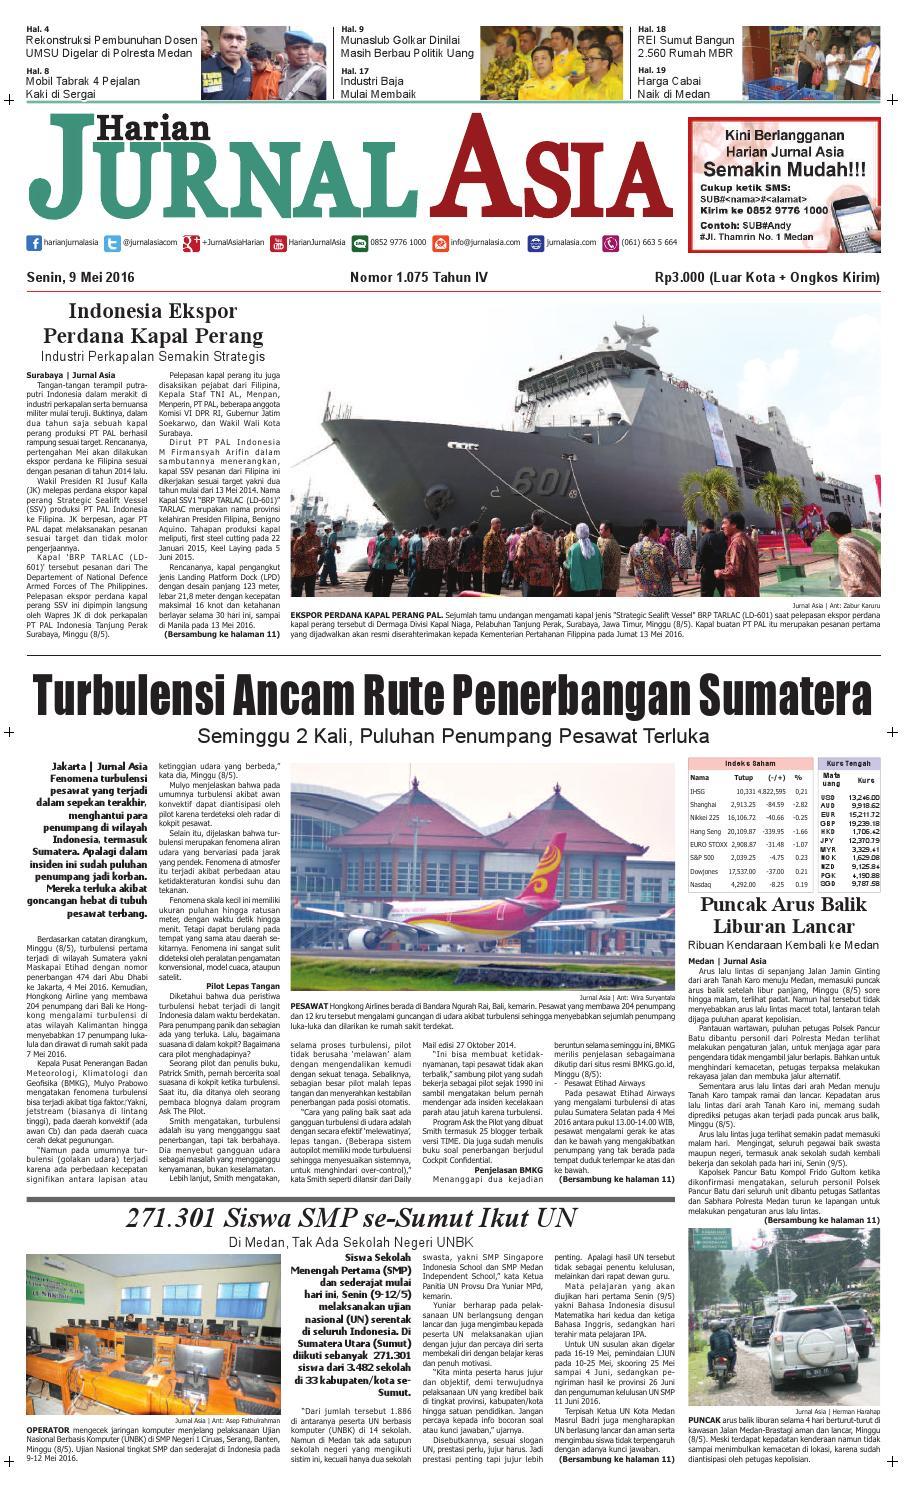 Harian Jurnal Asia Edisi Senin 09 Mei 2016 By Produk Ukm Bumn Blazer Jaquard Medan Issuu